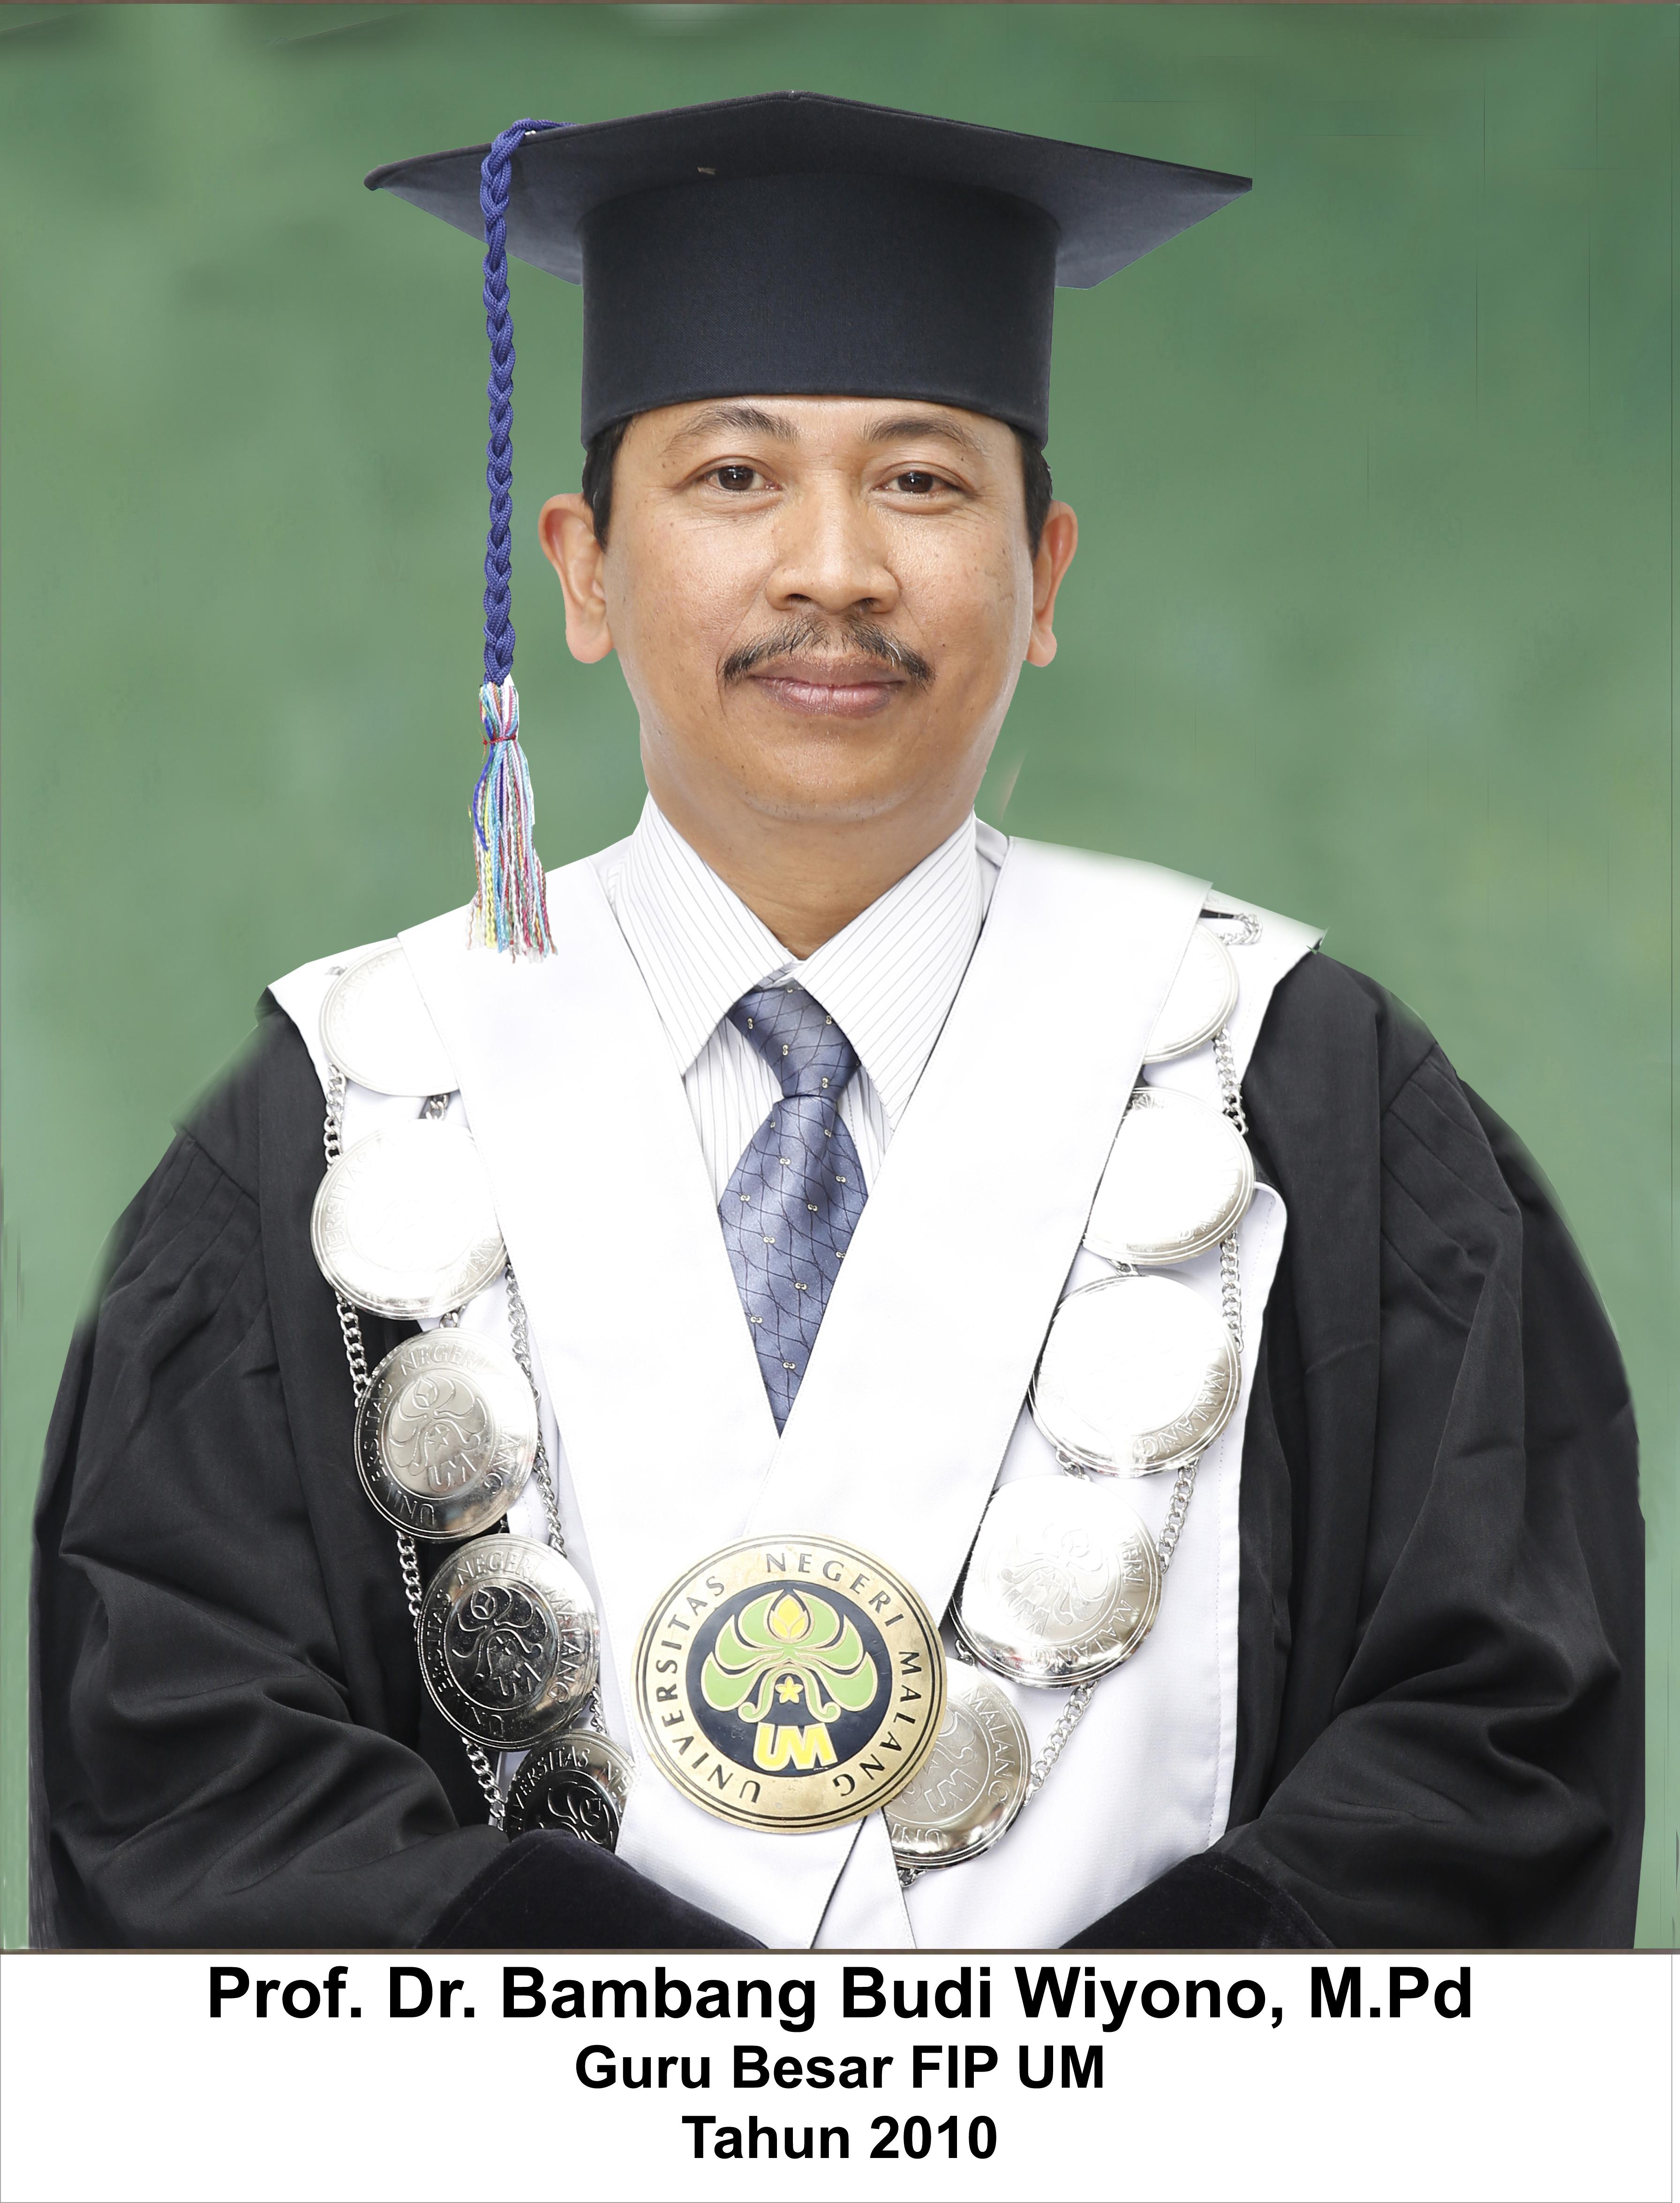 Prof. Dr. Bambang Budi Wiyono, MPd